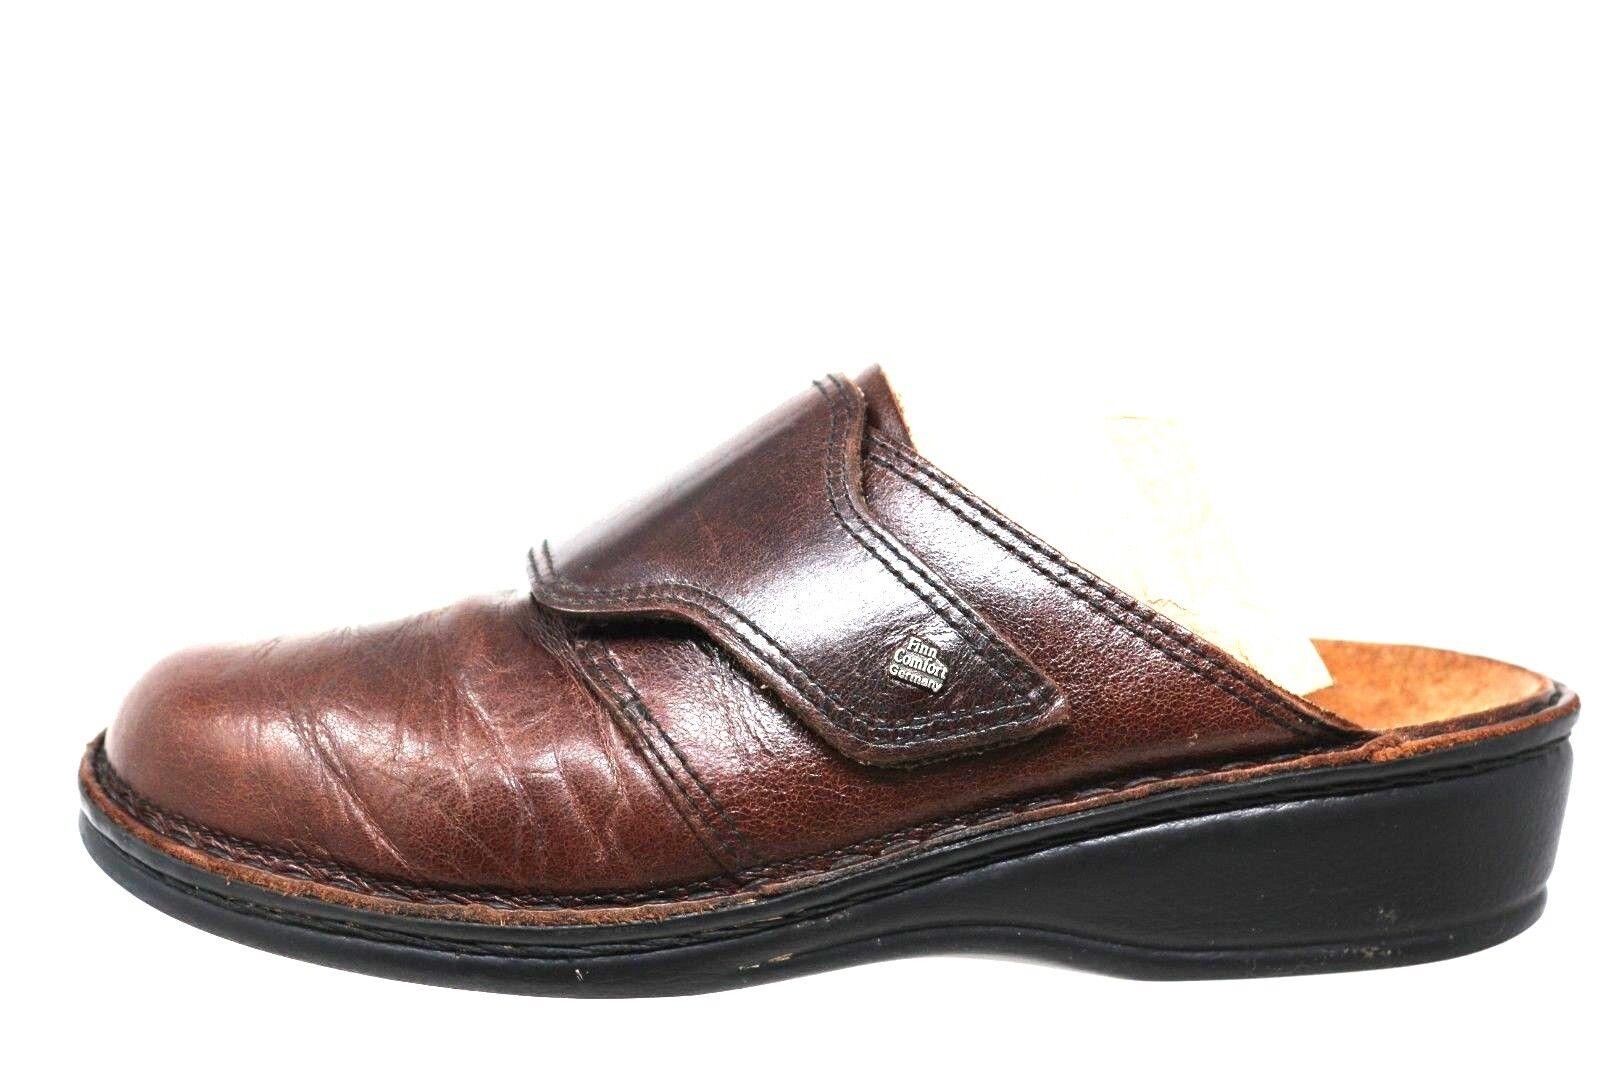 Finn Comfort Aussee braun Leather Hook Loop Footbed Clog damen Größe 38-7 7.5